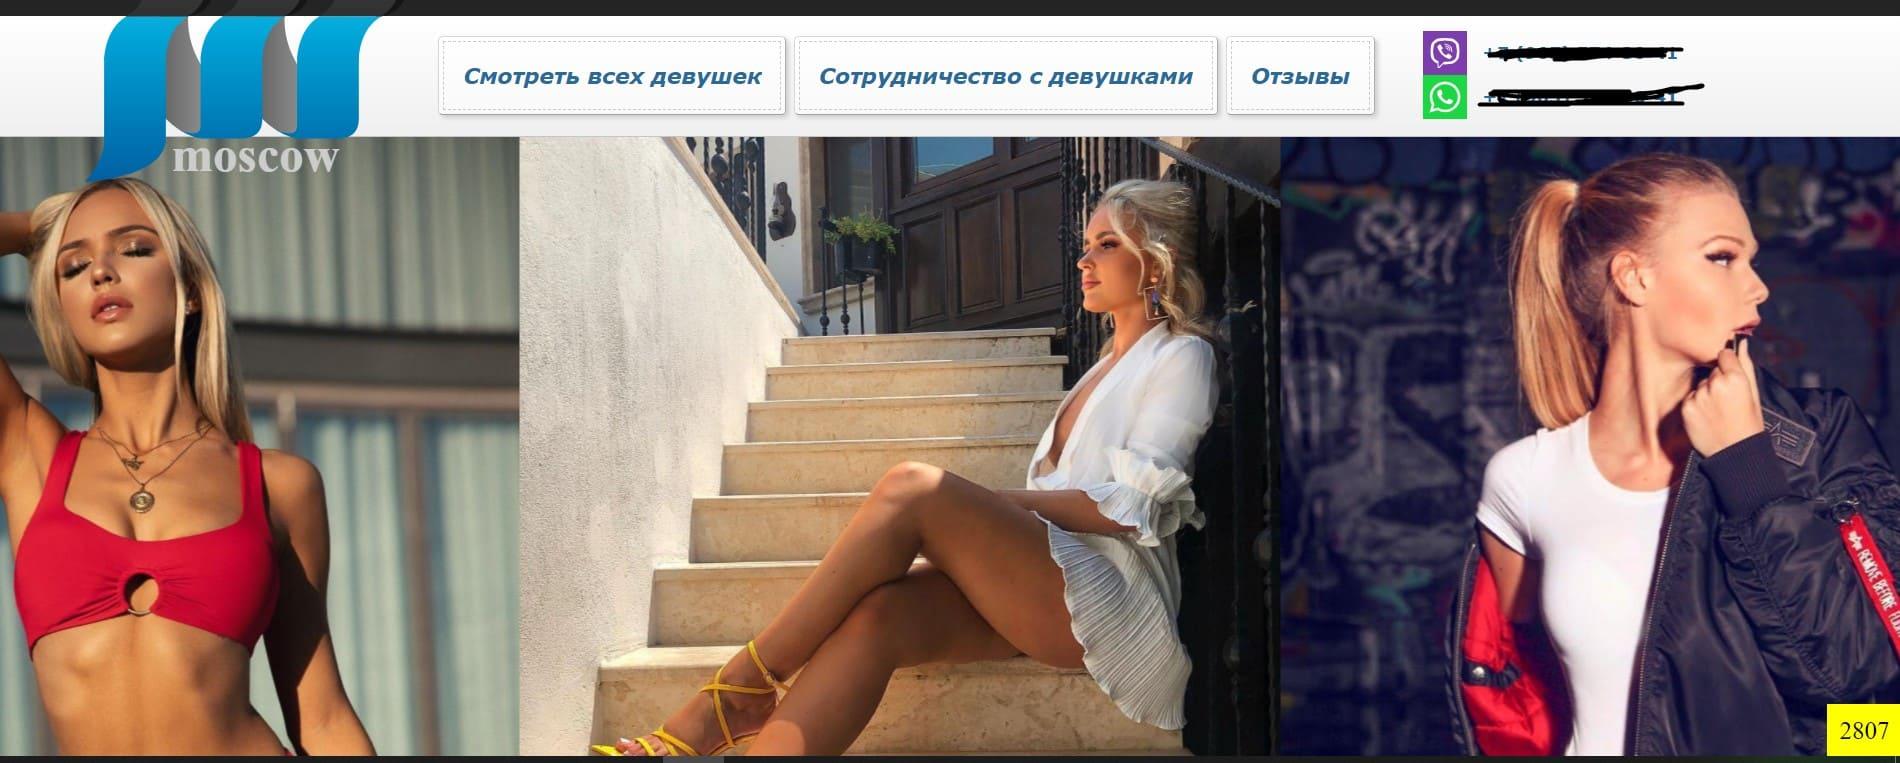 Реклама эскорт услуг в интернете.